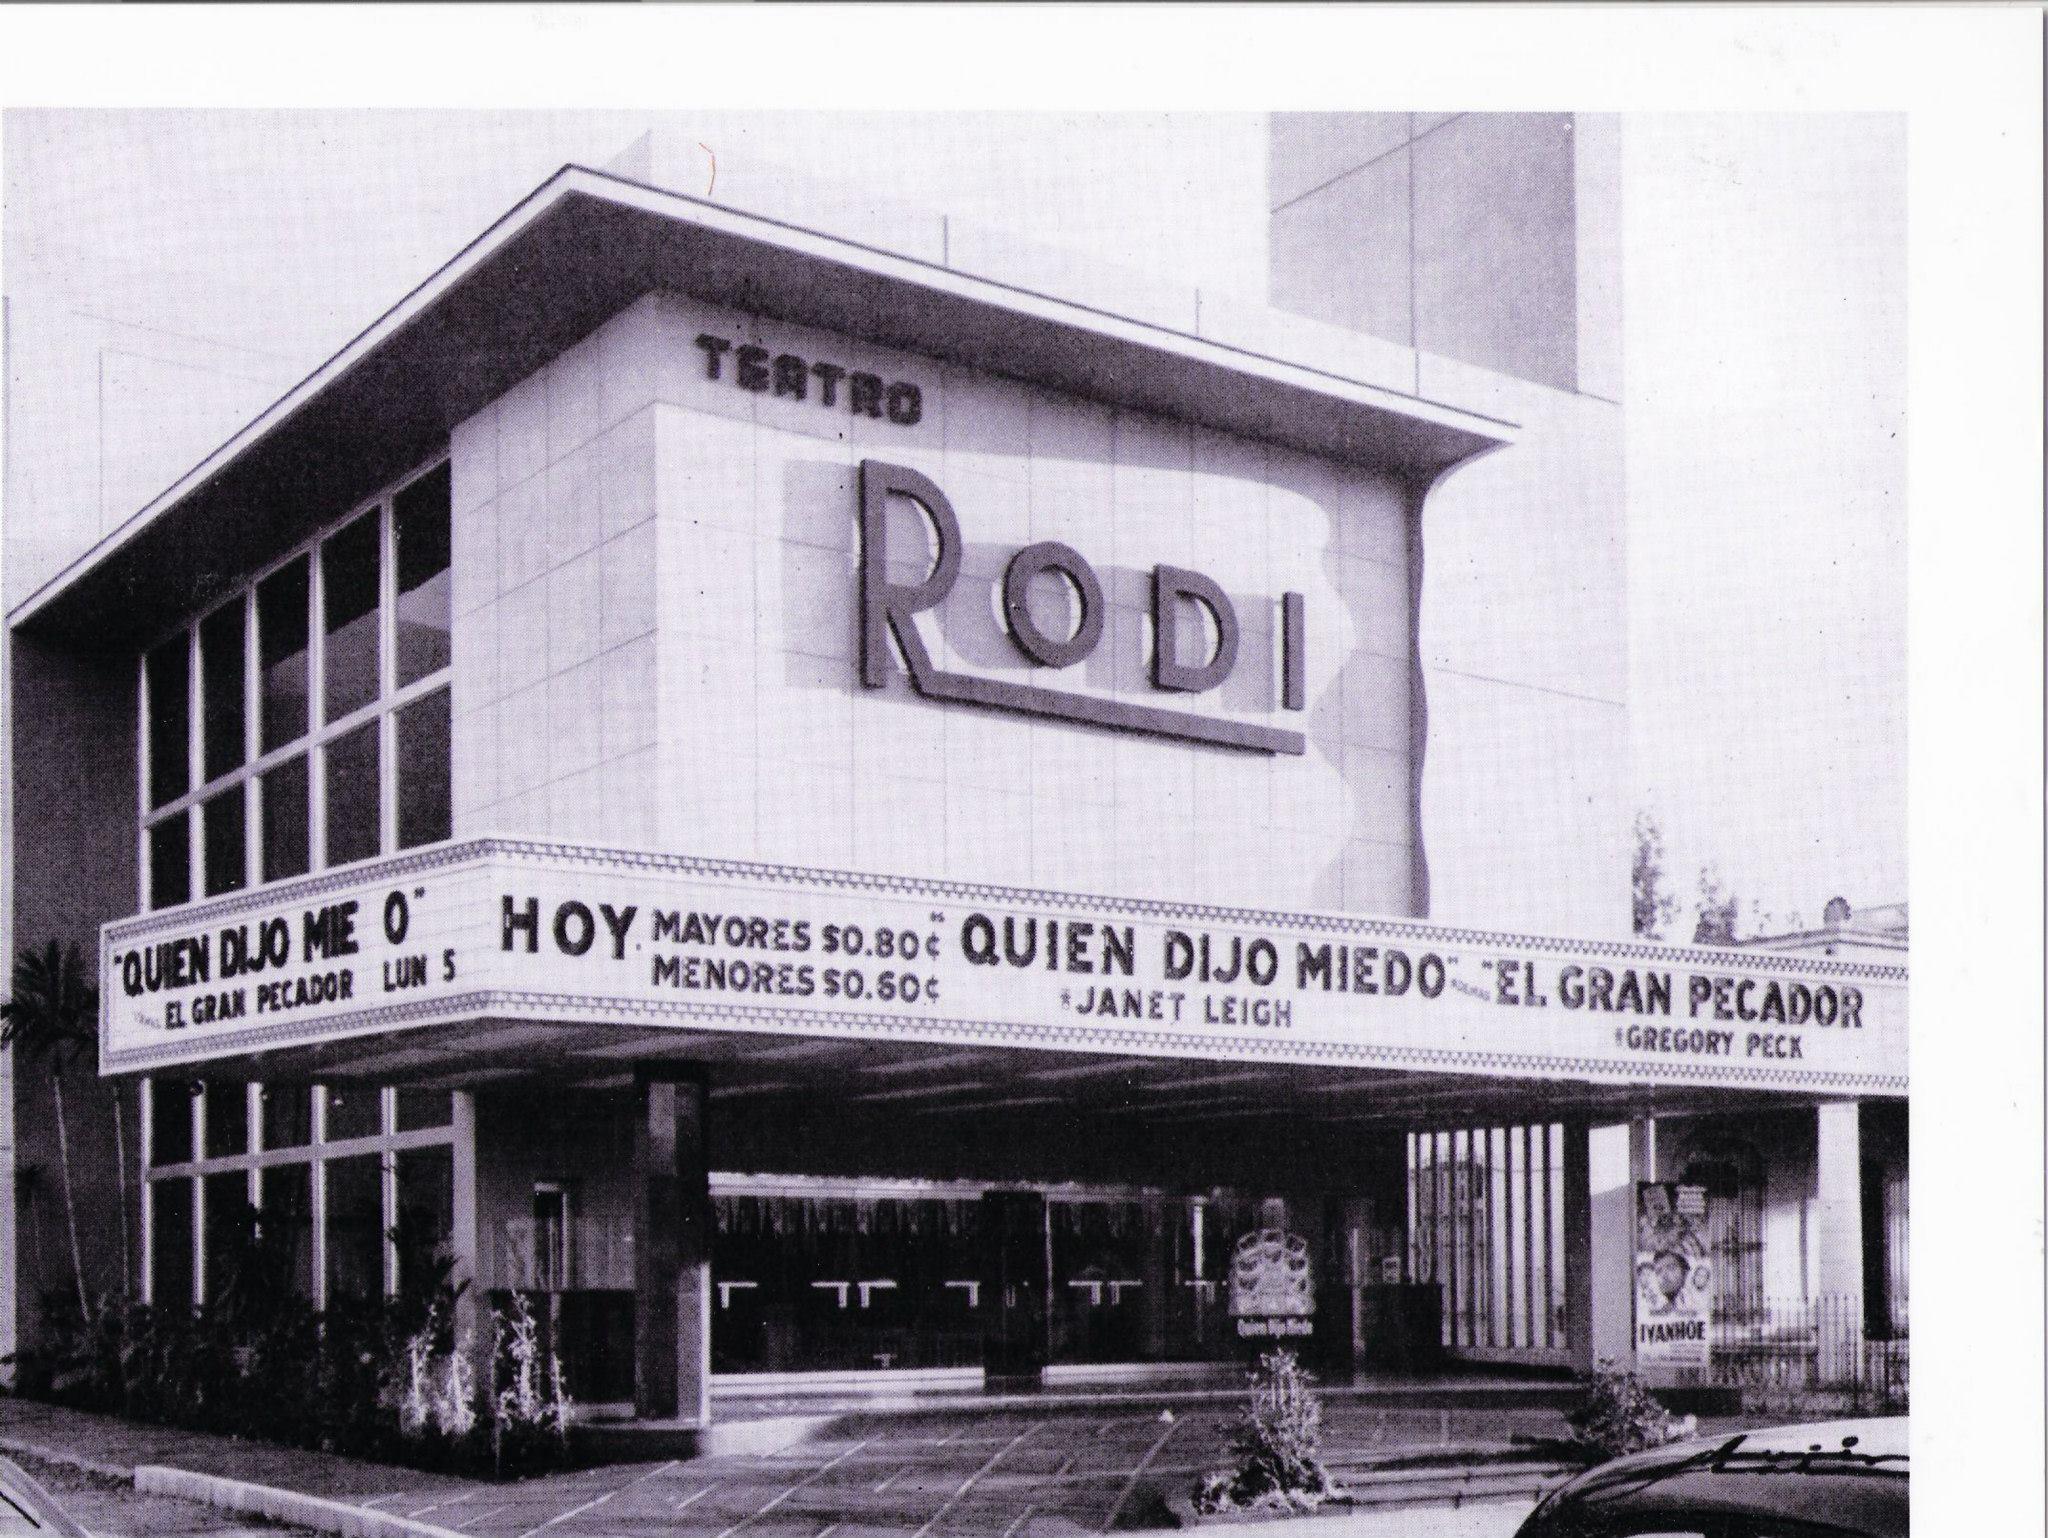 Teatro Rodi (Now called Mella) Linea Street, Vedado, La Habana